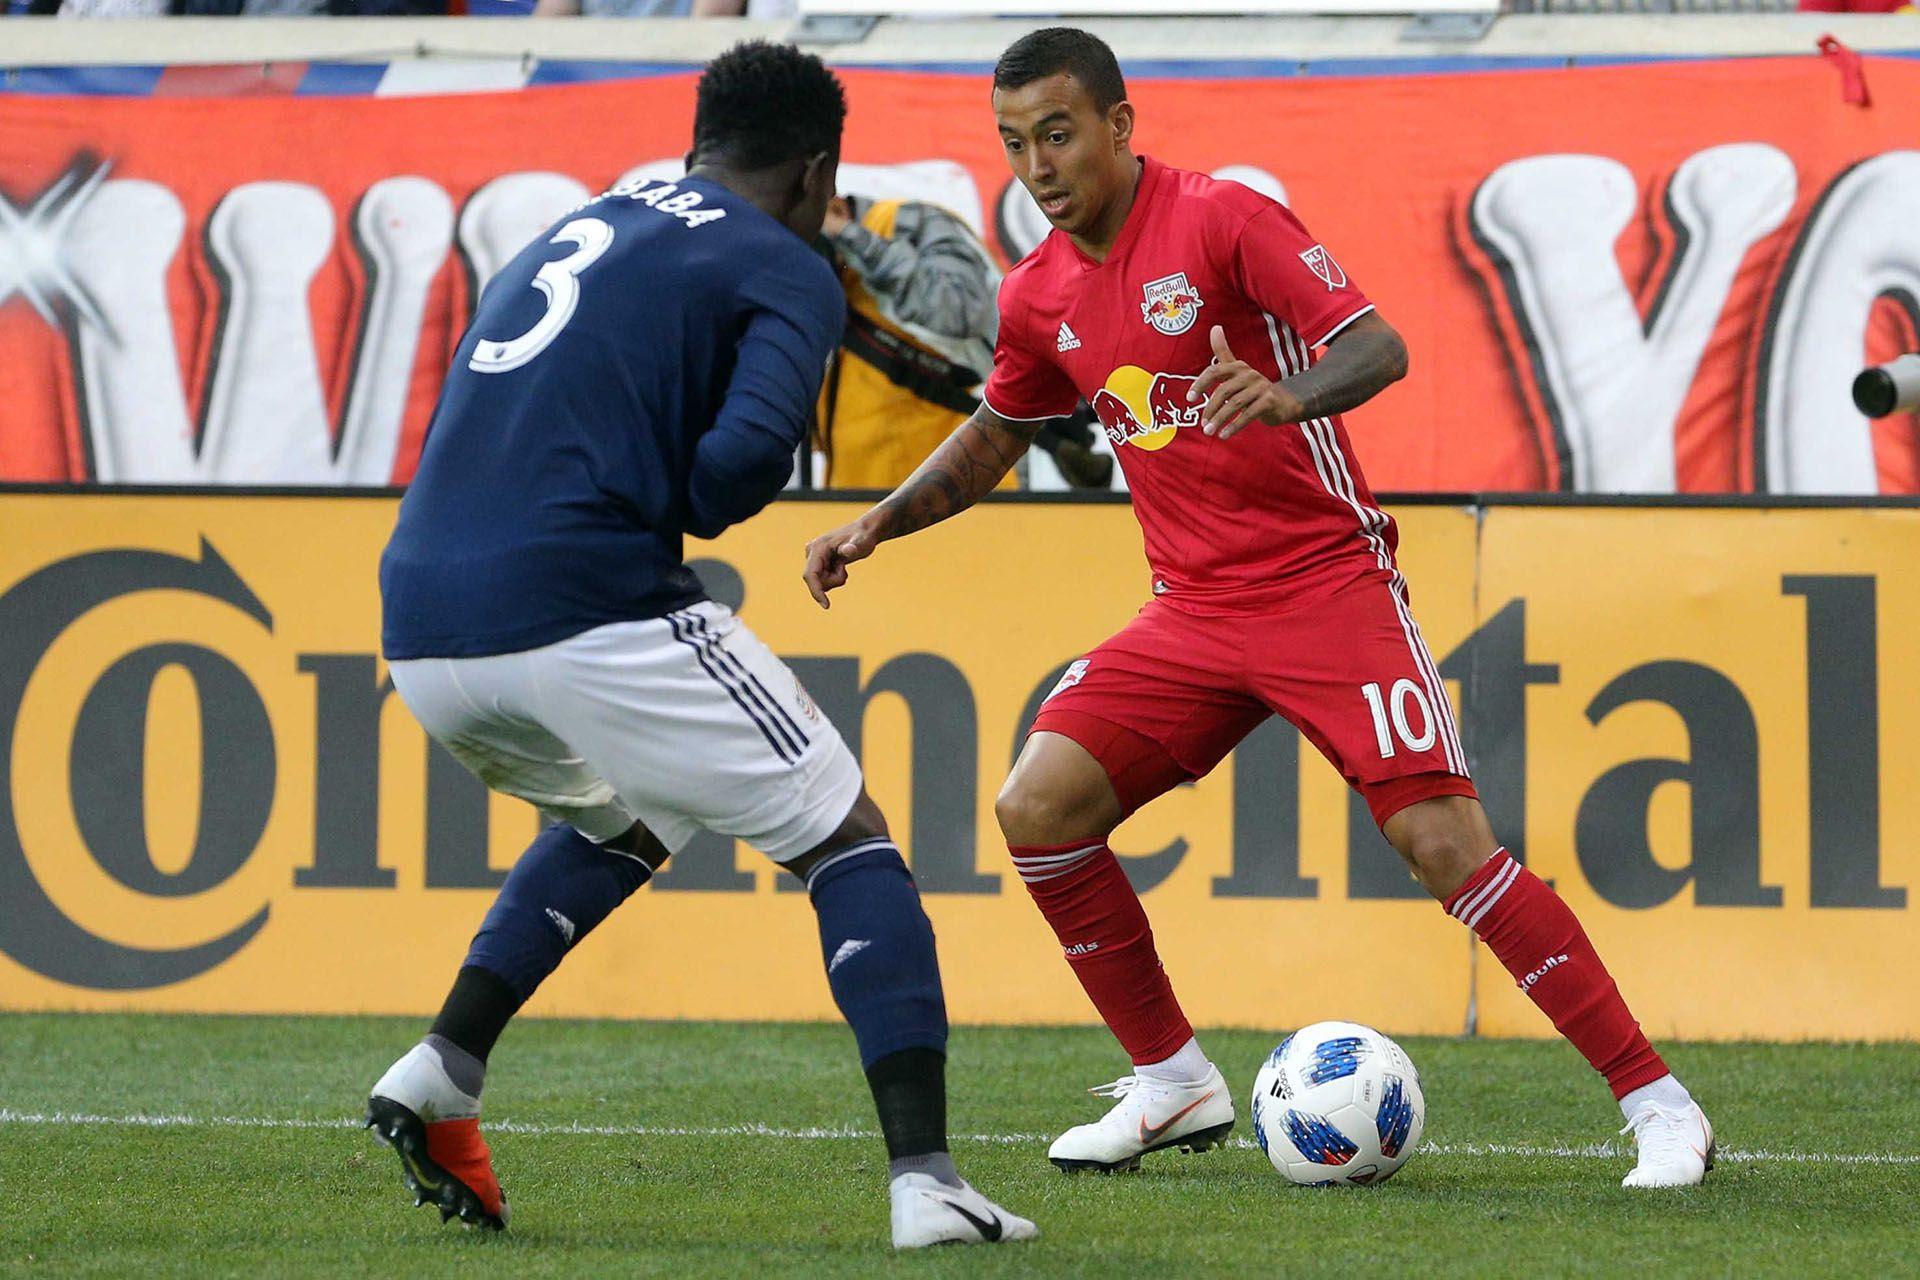 Kaku Romero Gamarra juega en la MLS actualmente (Foto: Reuters)